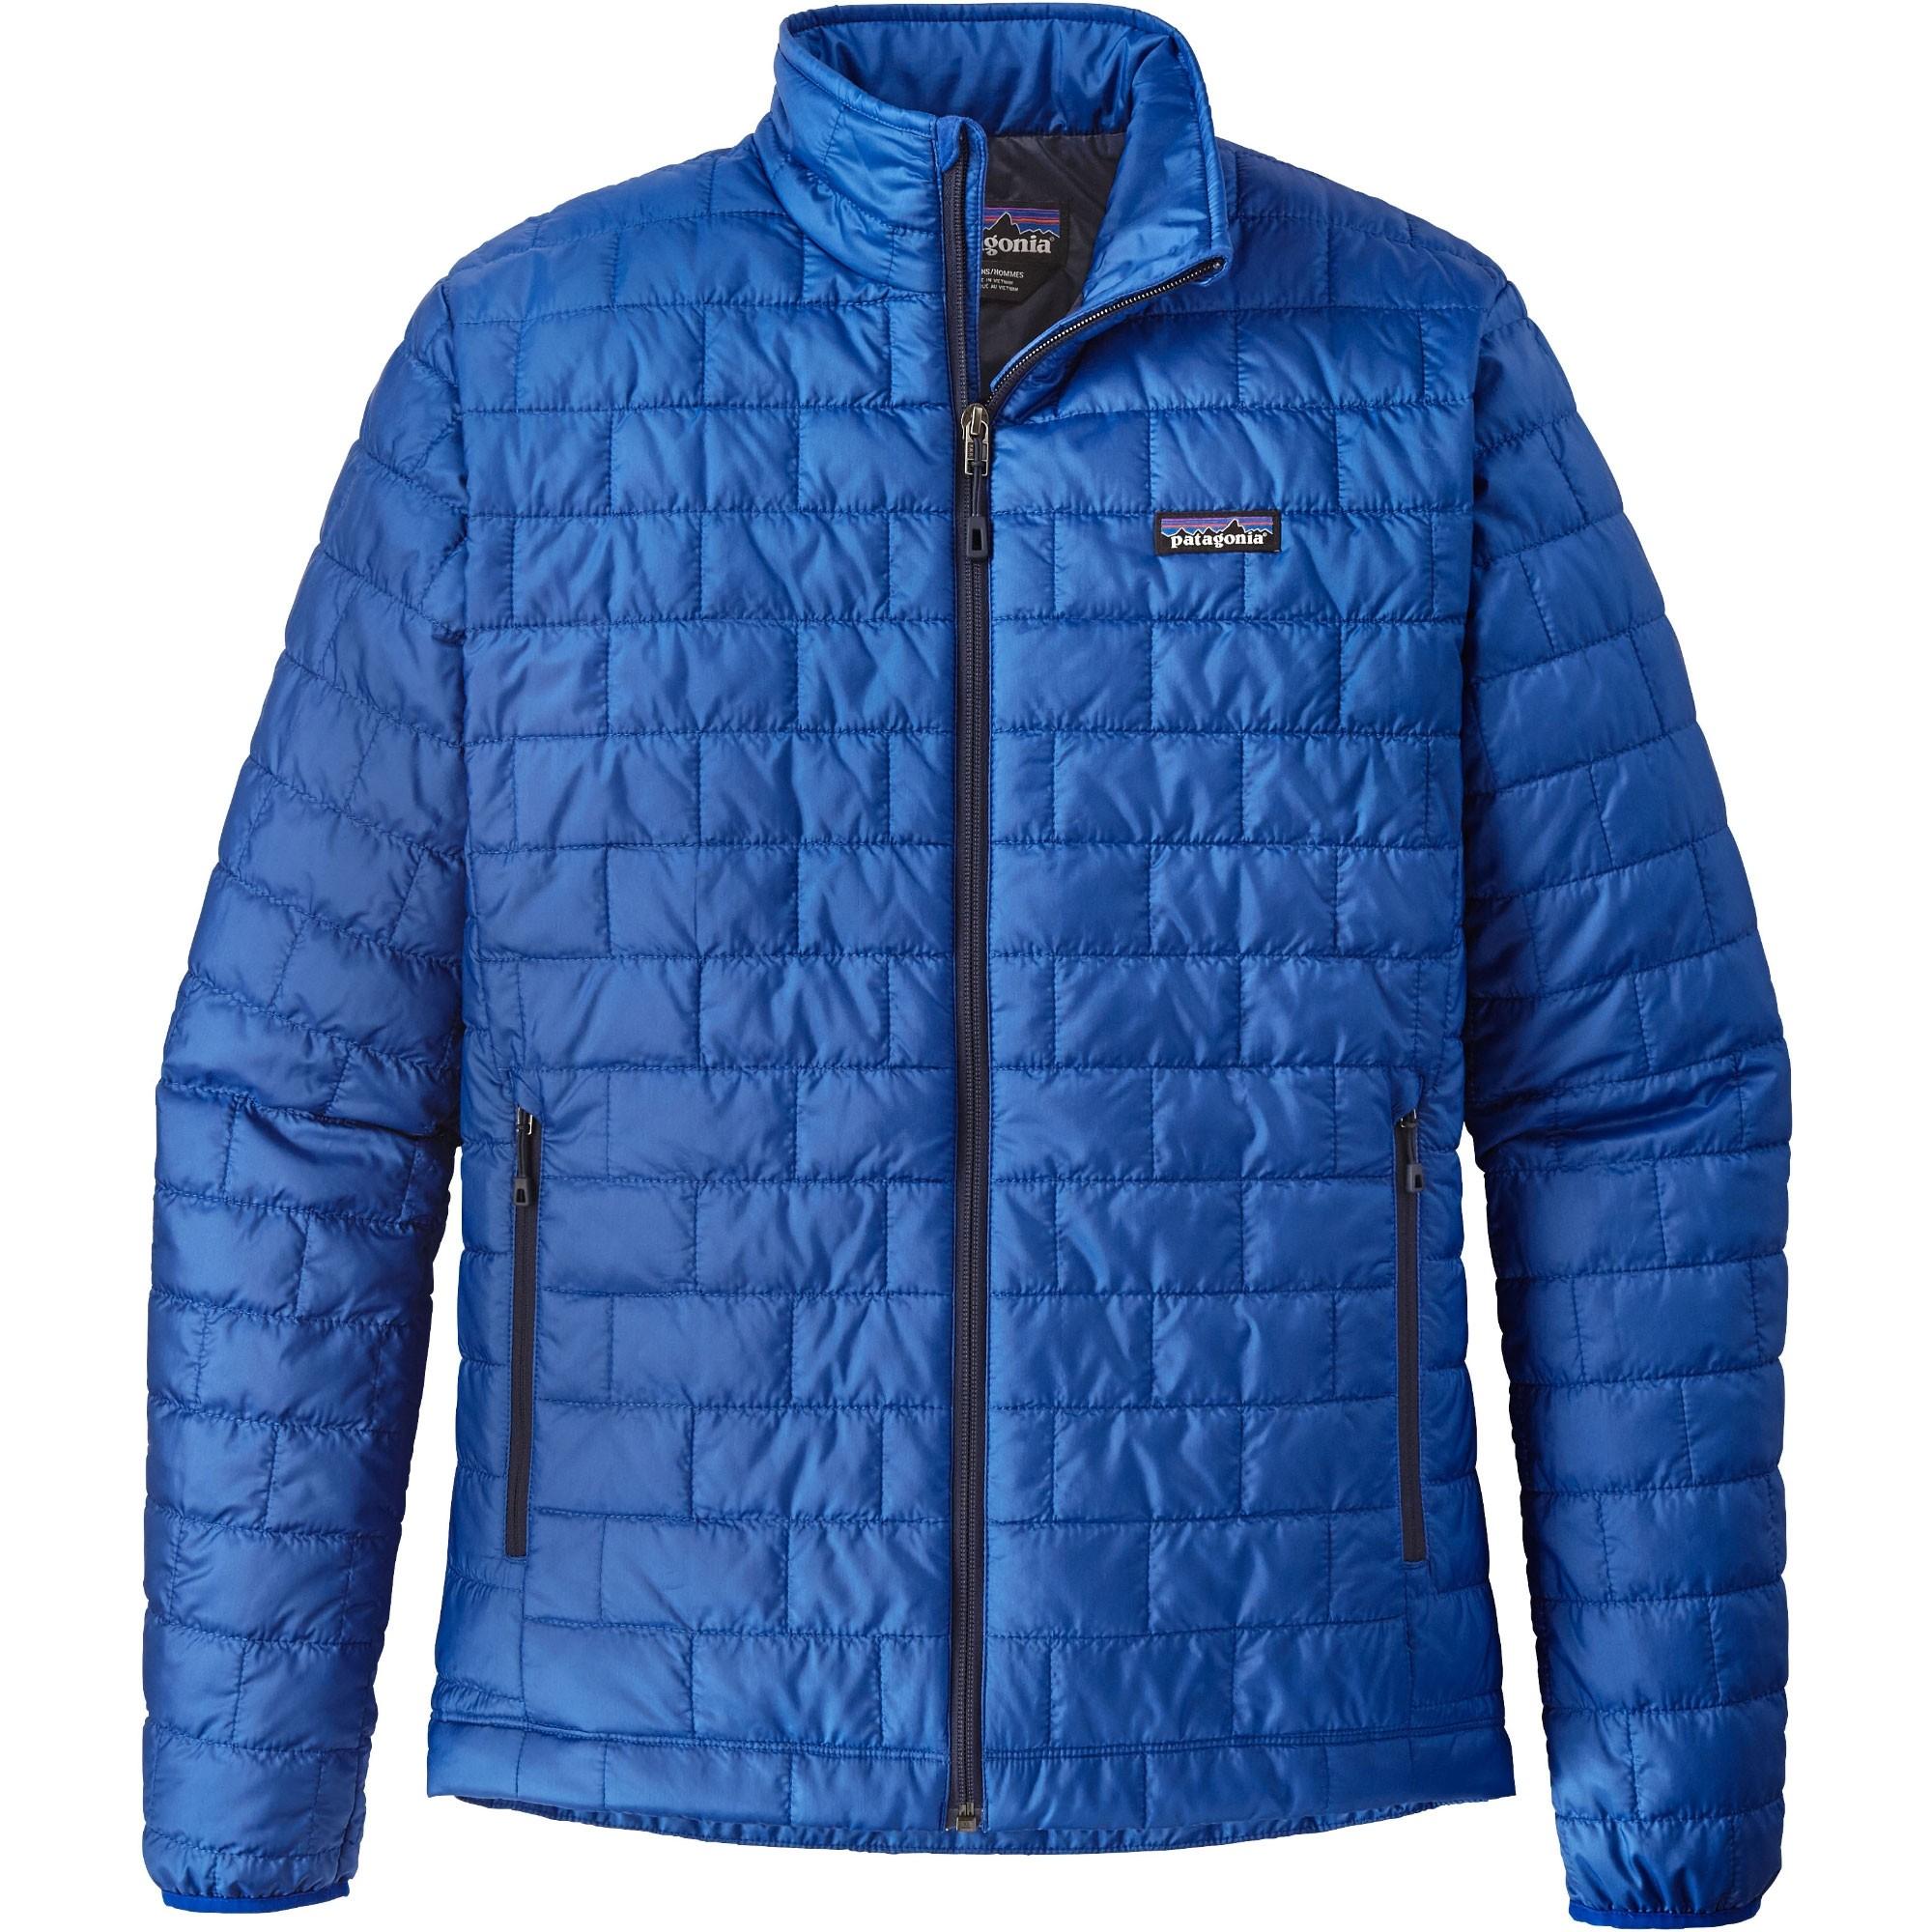 Patagonia Nano Puff Jacket Viking Blue